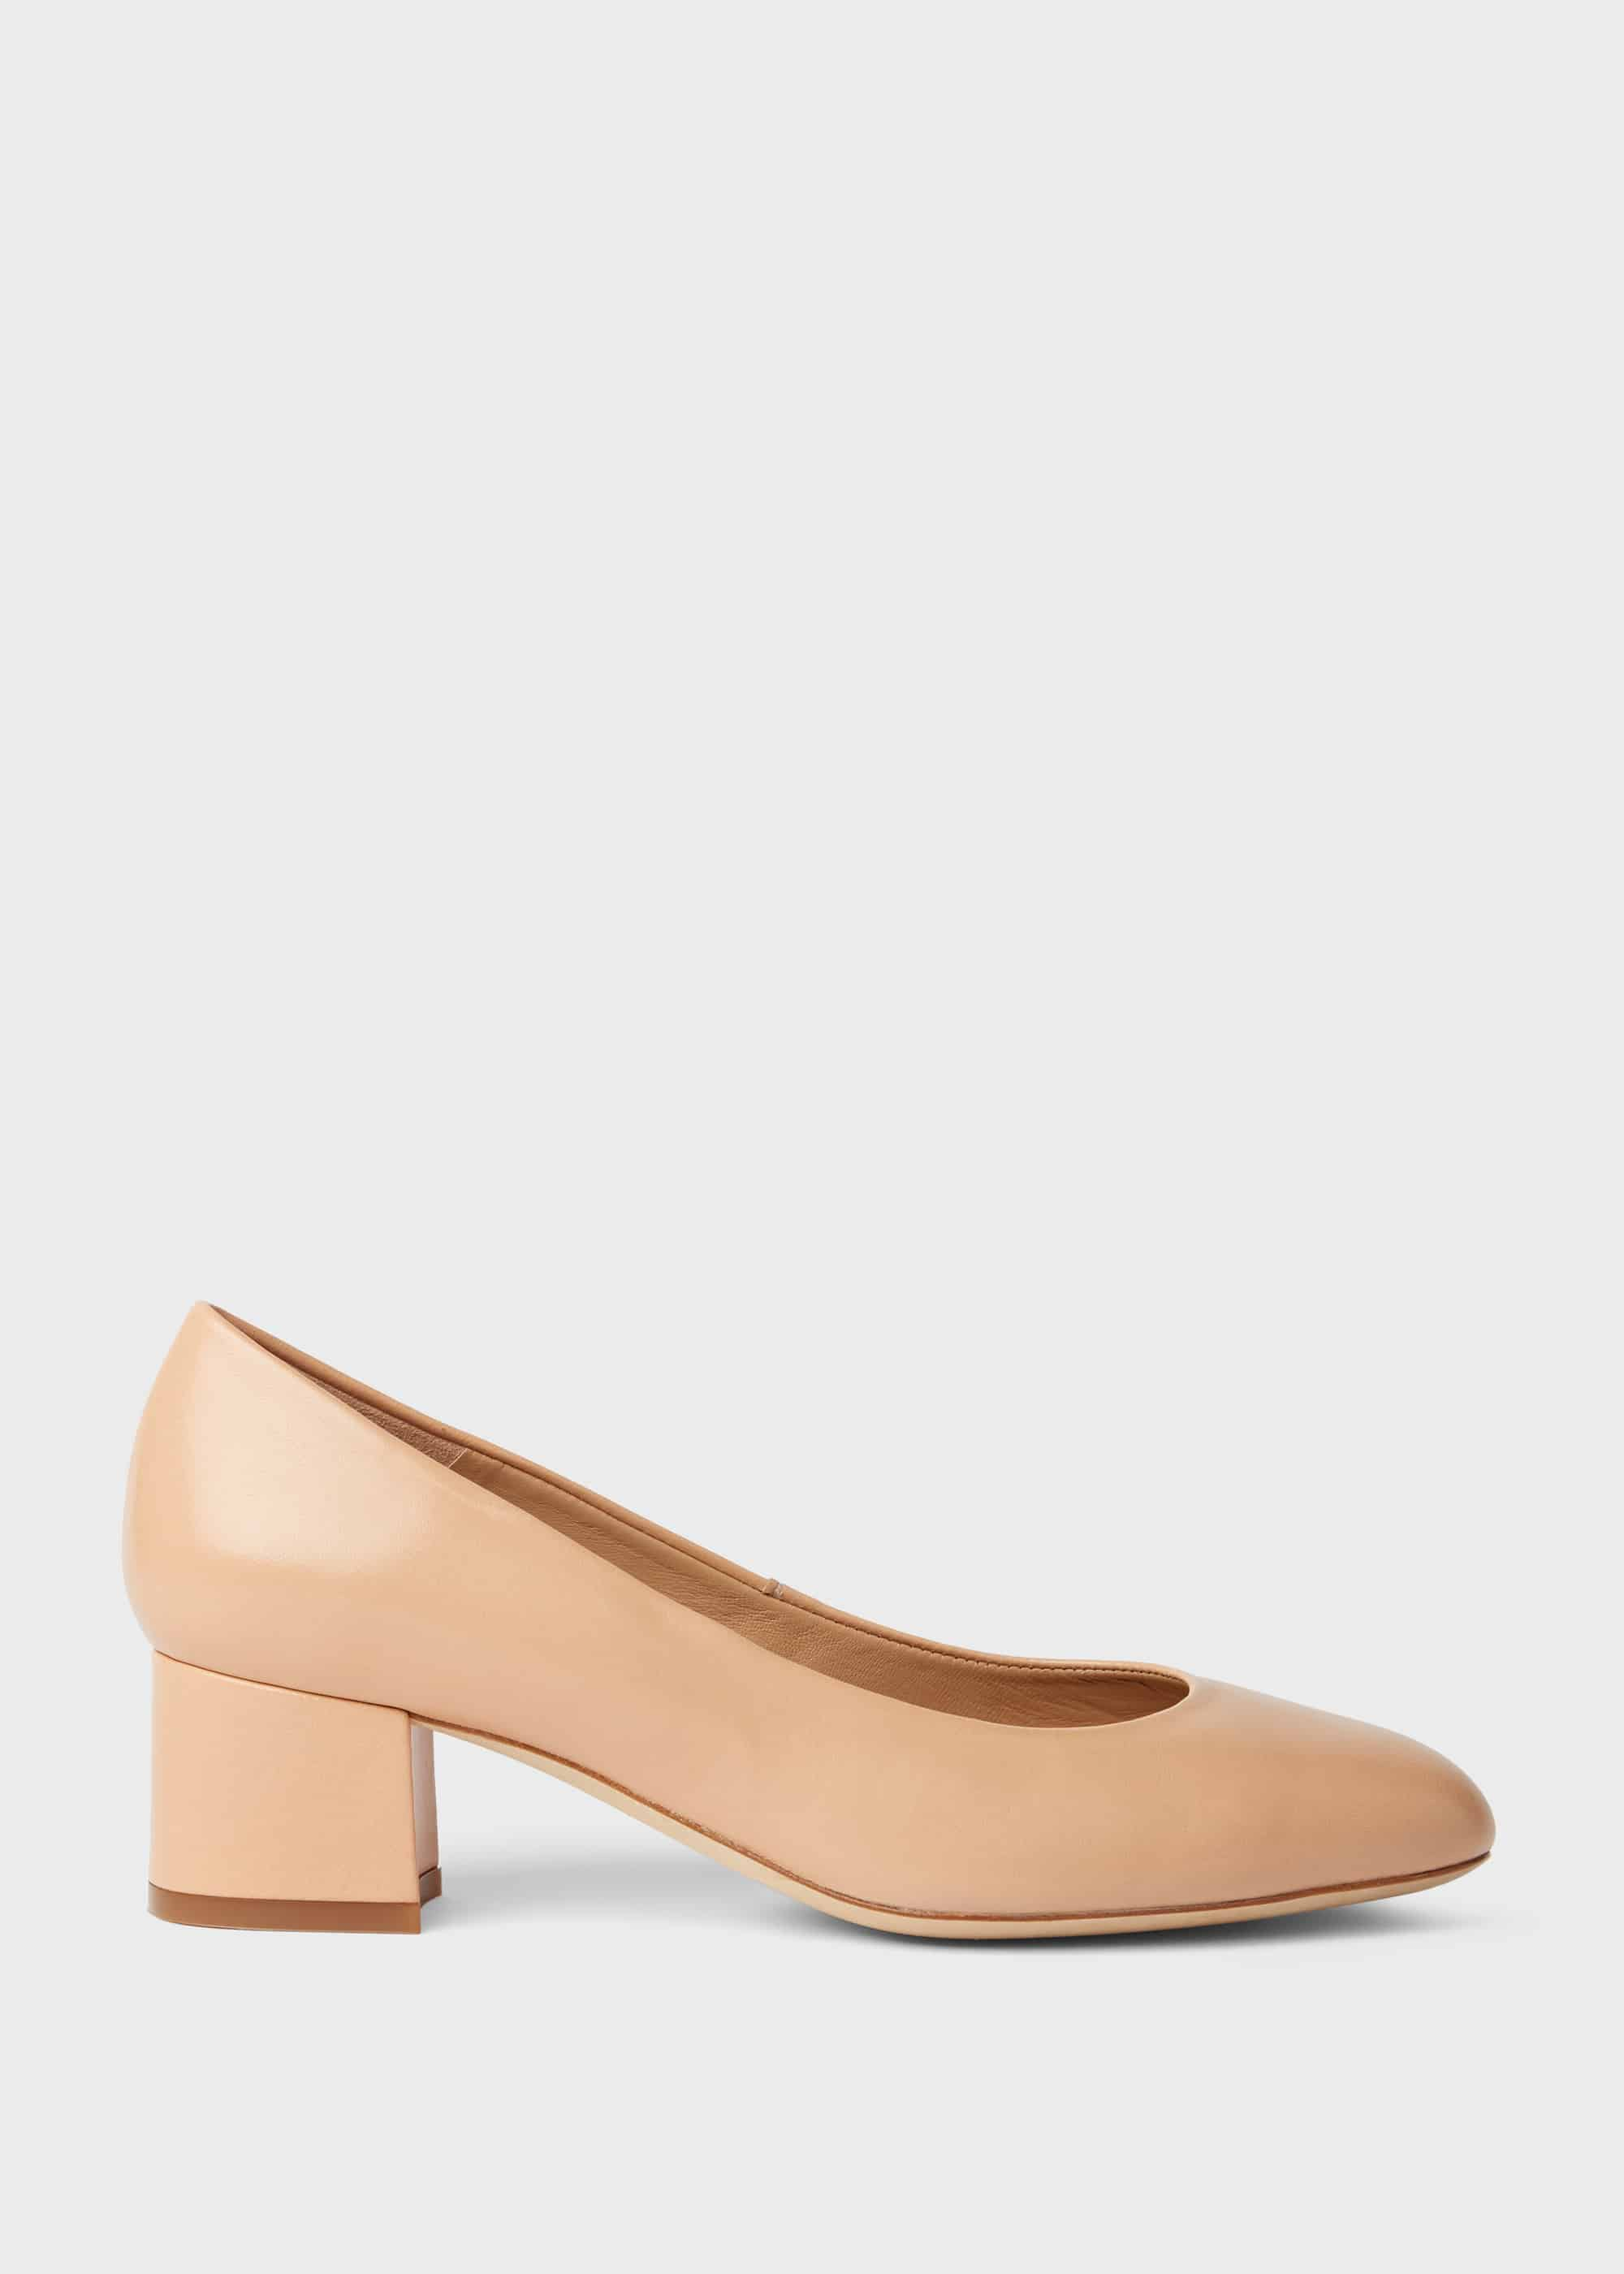 Hobbs Women Natalie Wide Fit Leather Block Heel Court Shoes